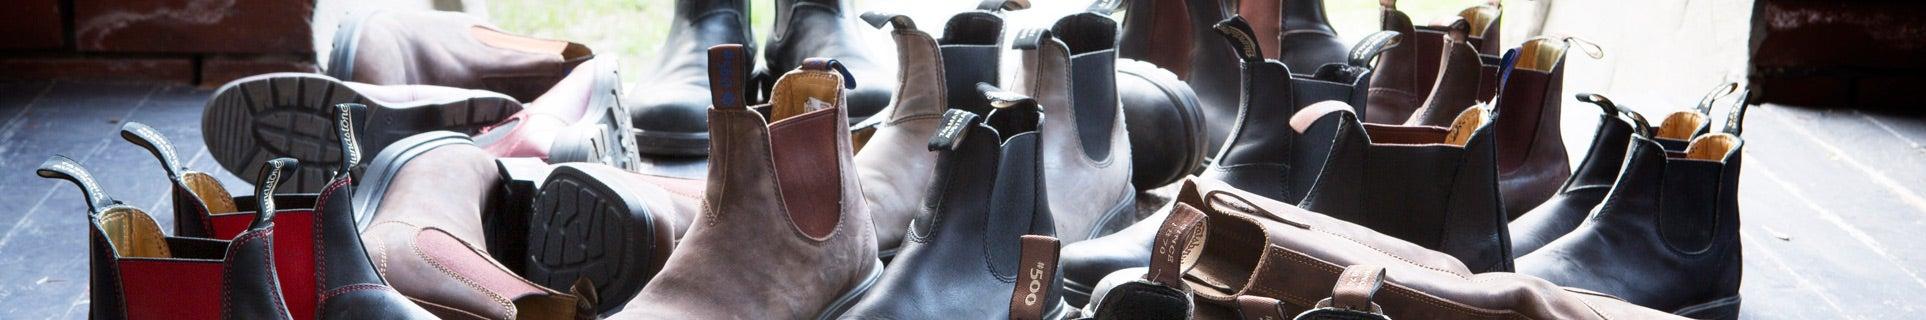 Blundstone shoe-care